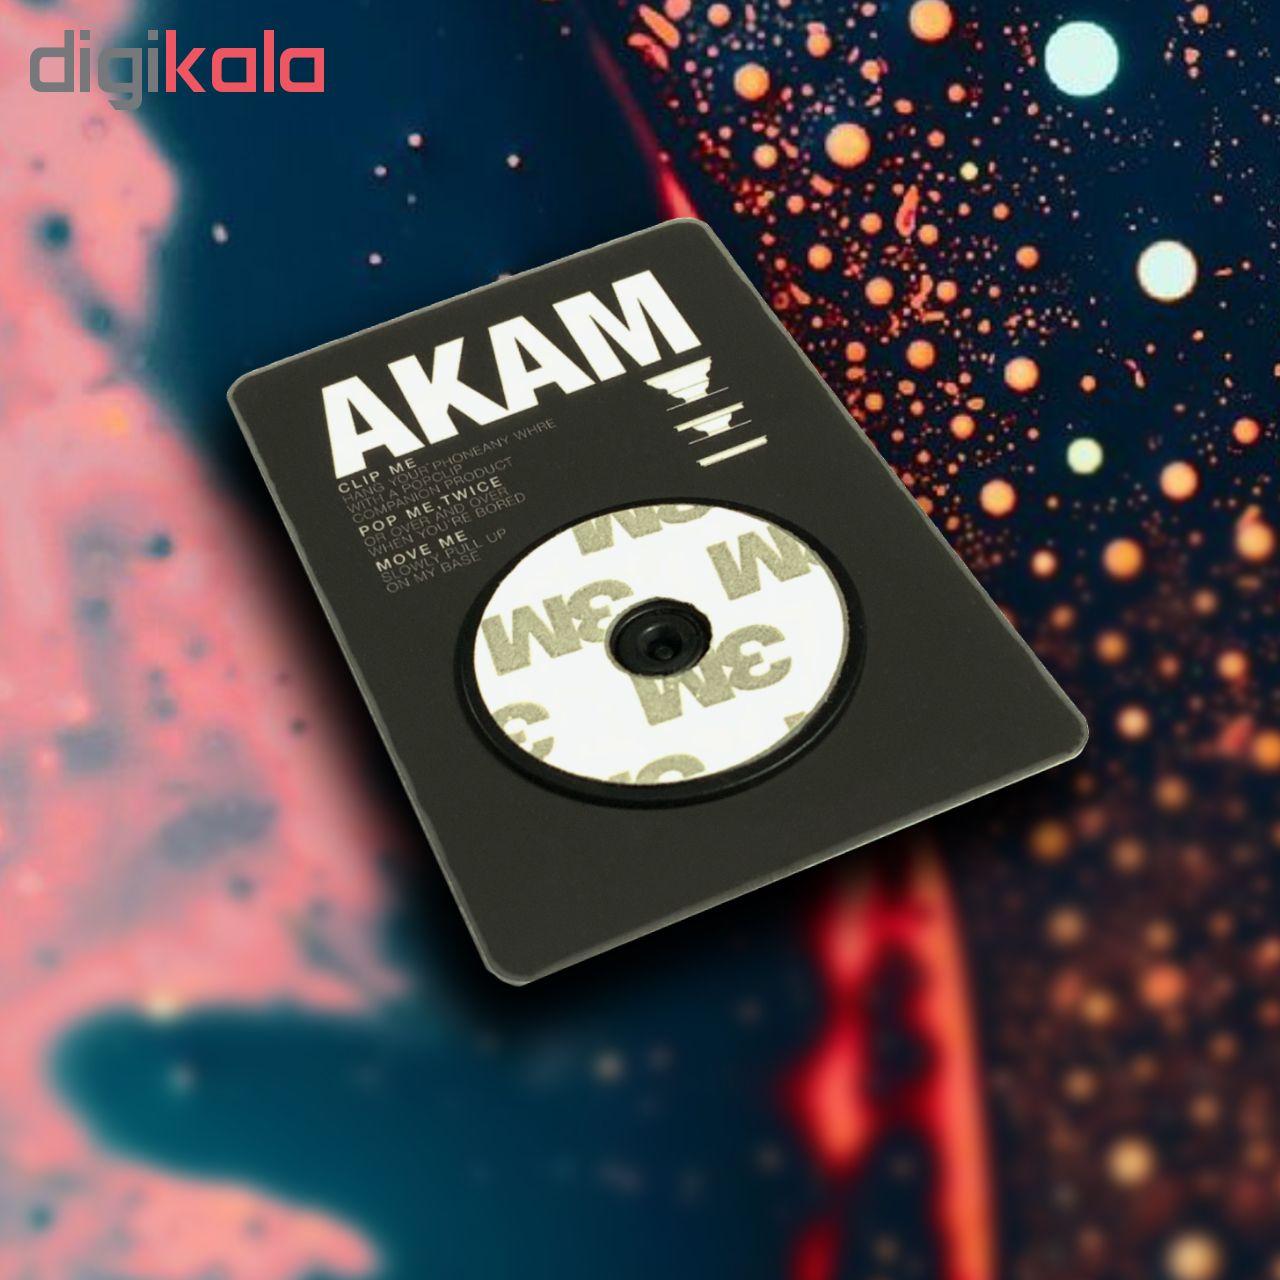 پایه نگهدارنده گوشی موبایل پاپ سوکت آکام مدل APS0195 main 1 2